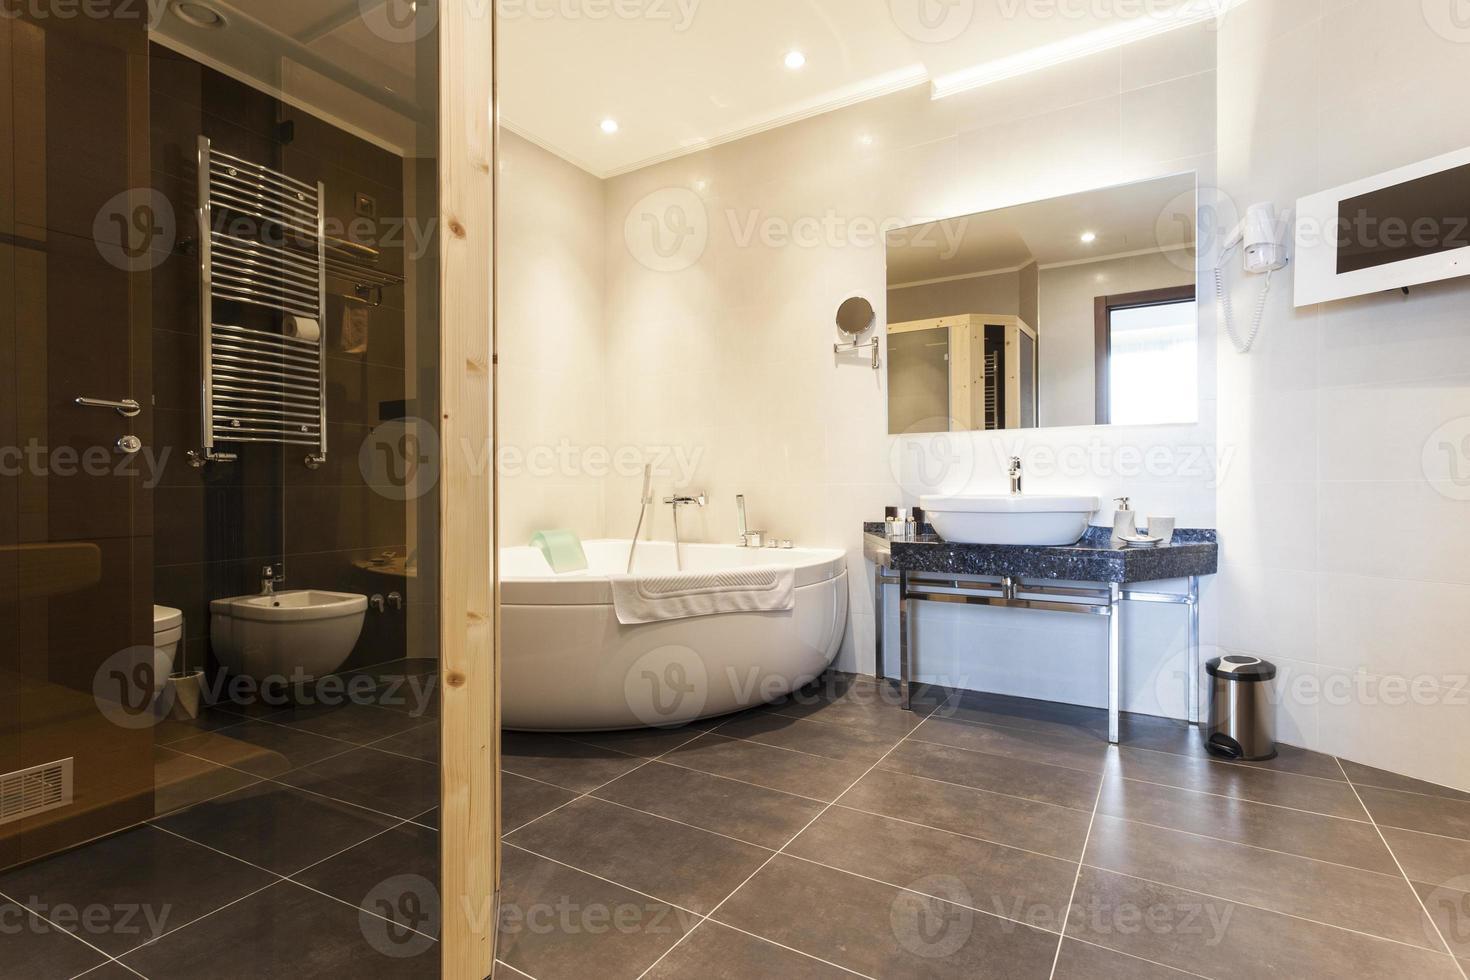 interieur van een moderne ruime badkamer foto